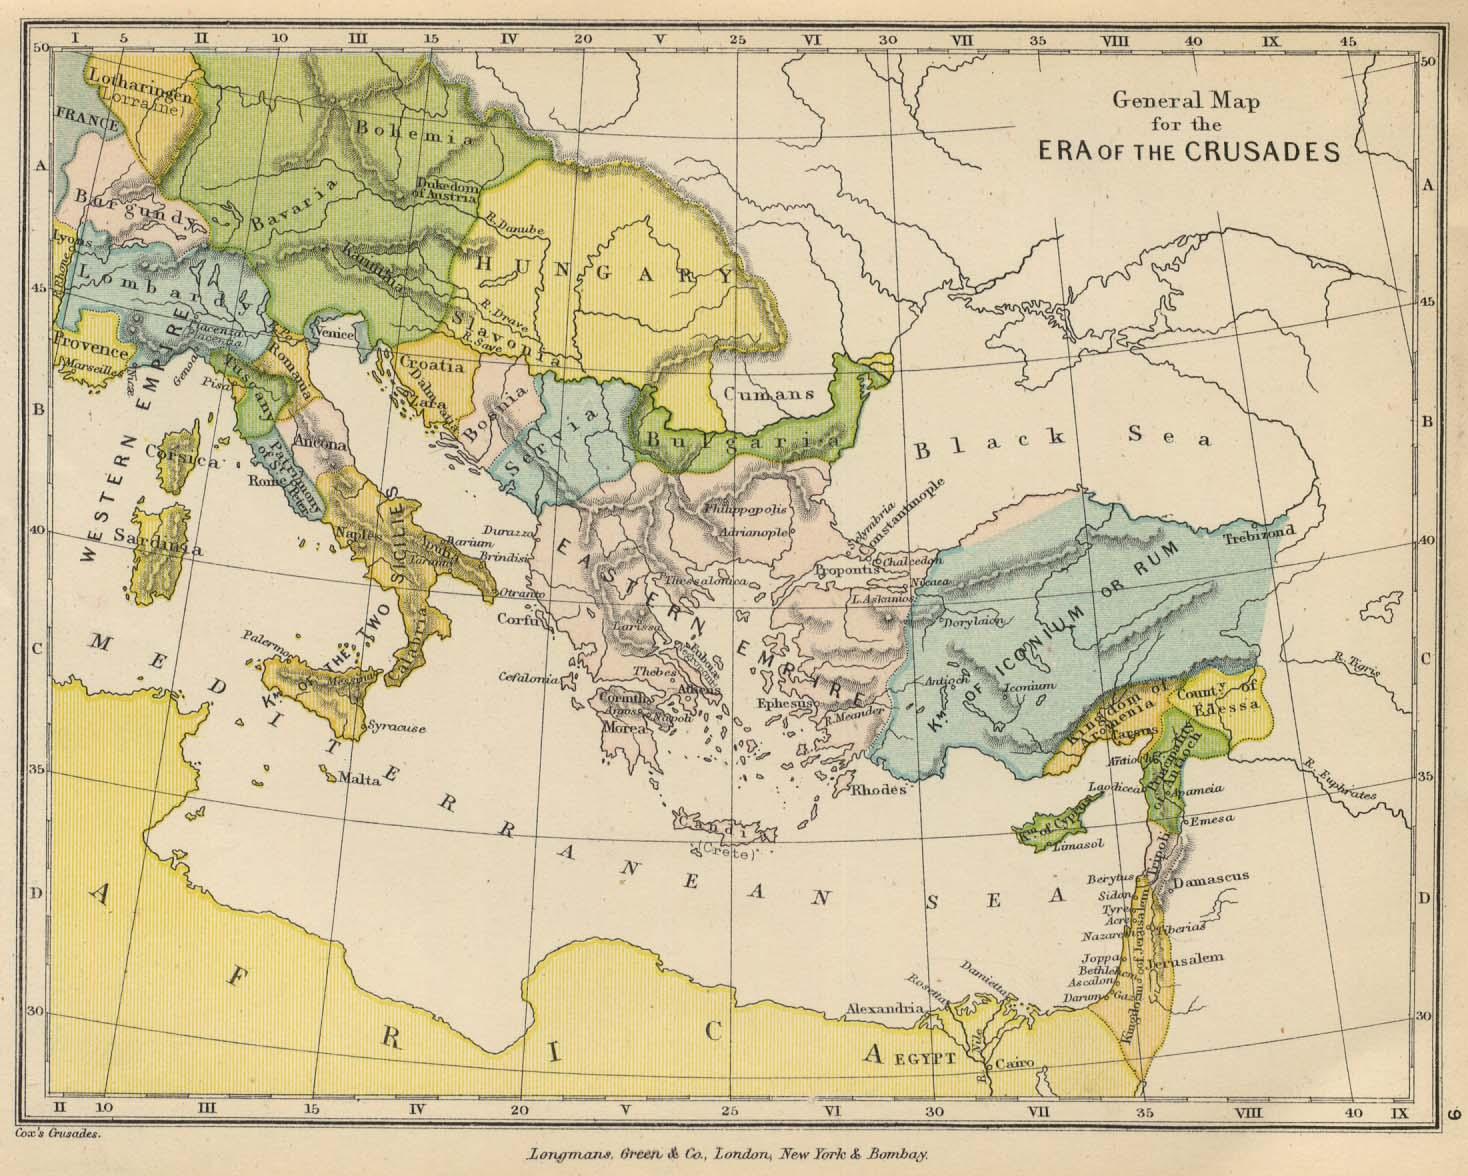 Reisenett historical maps of europe europe crusades era gumiabroncs Images